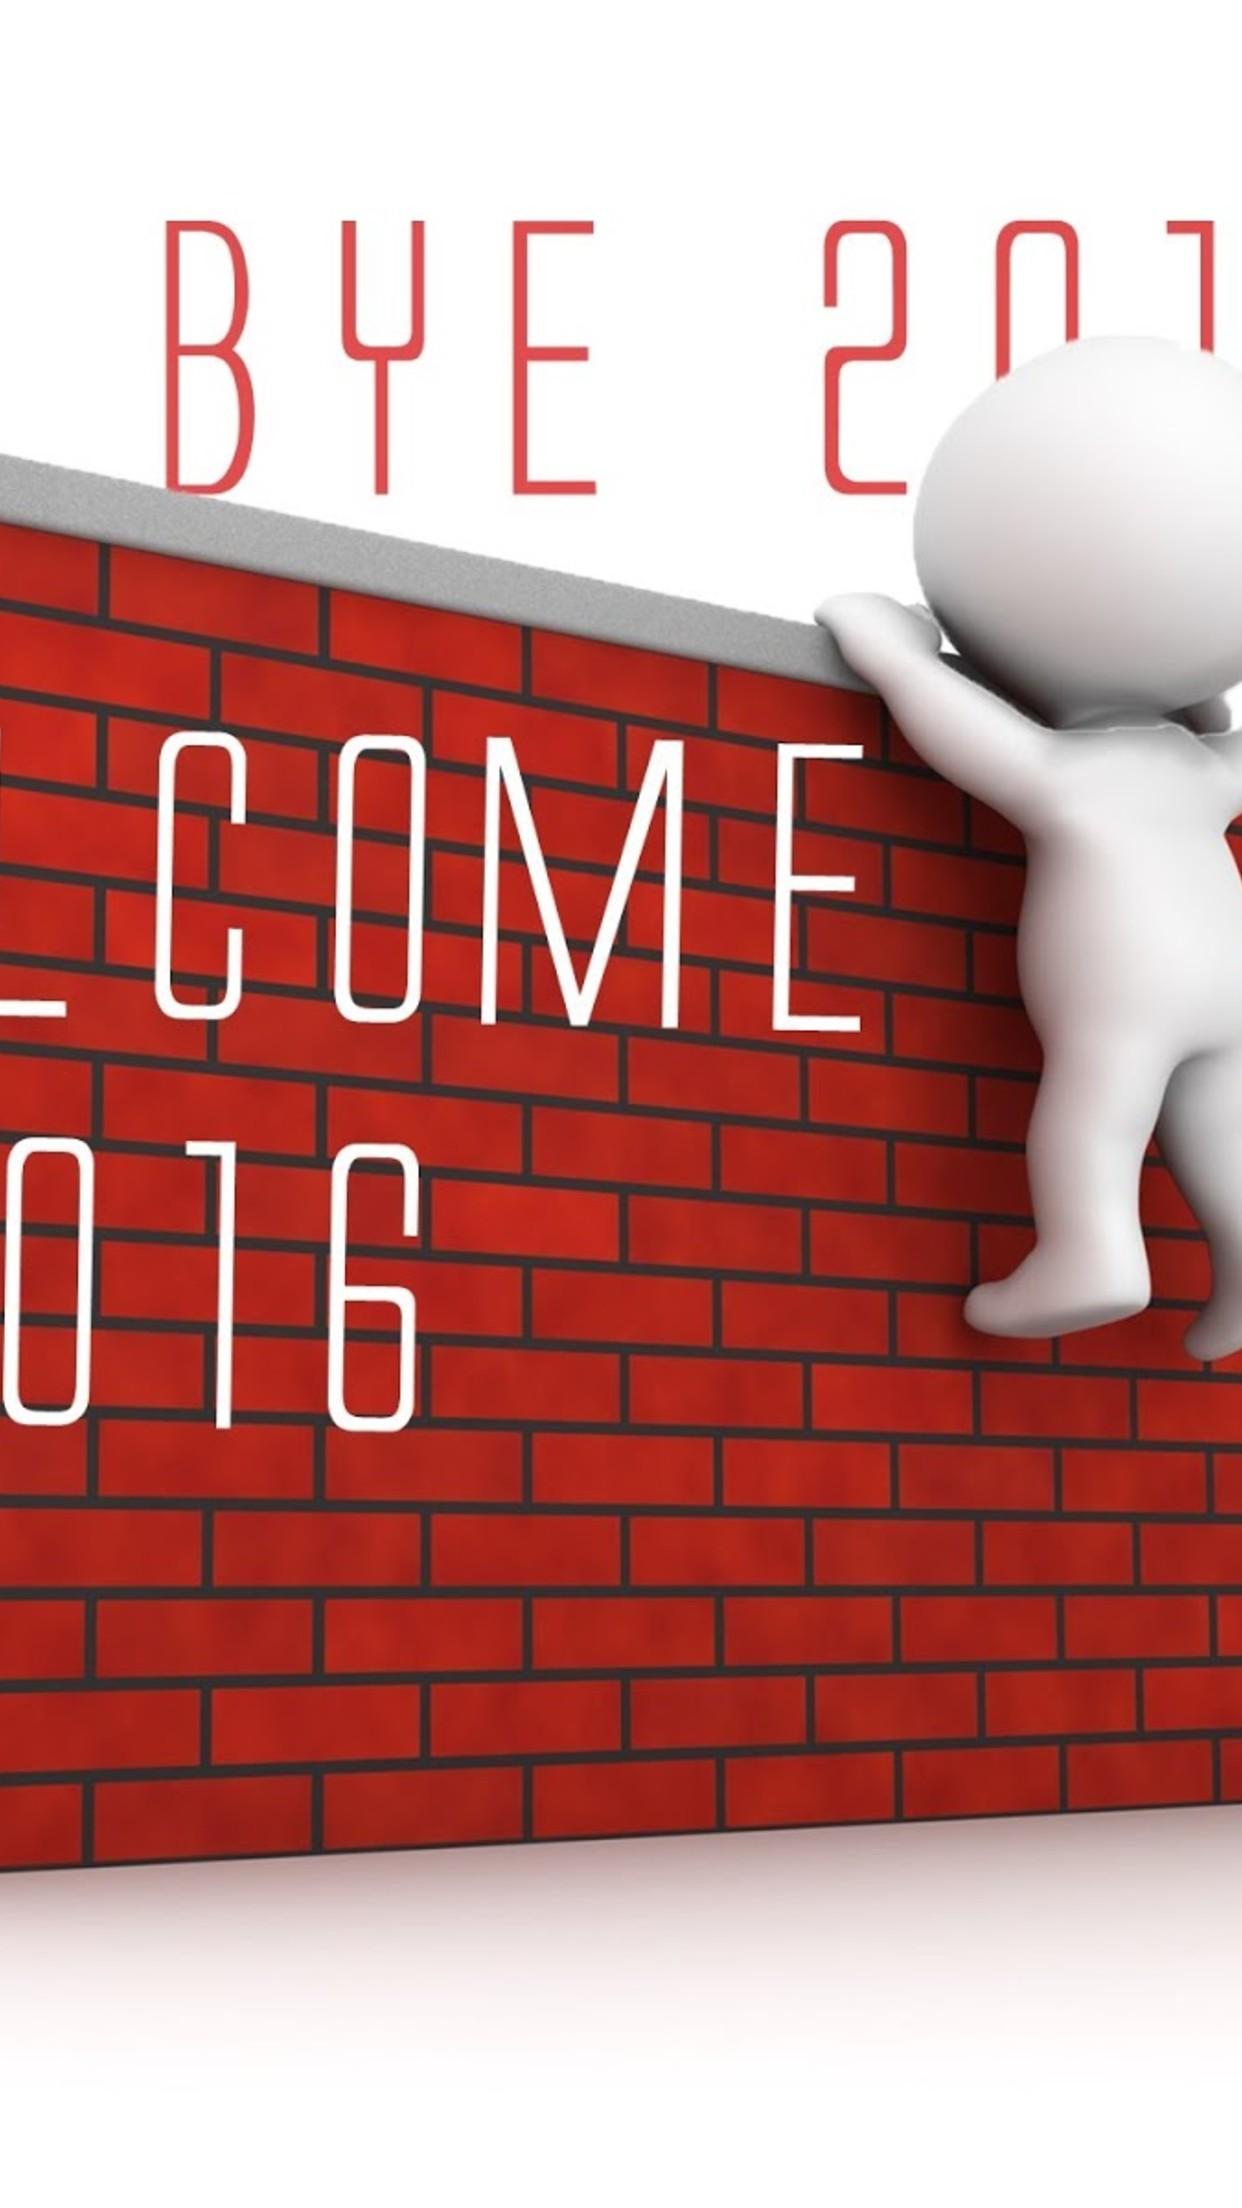 Download Wallpaper 1242x2208 Good bye 2015 welcome 2016   Happy New 1242x2208